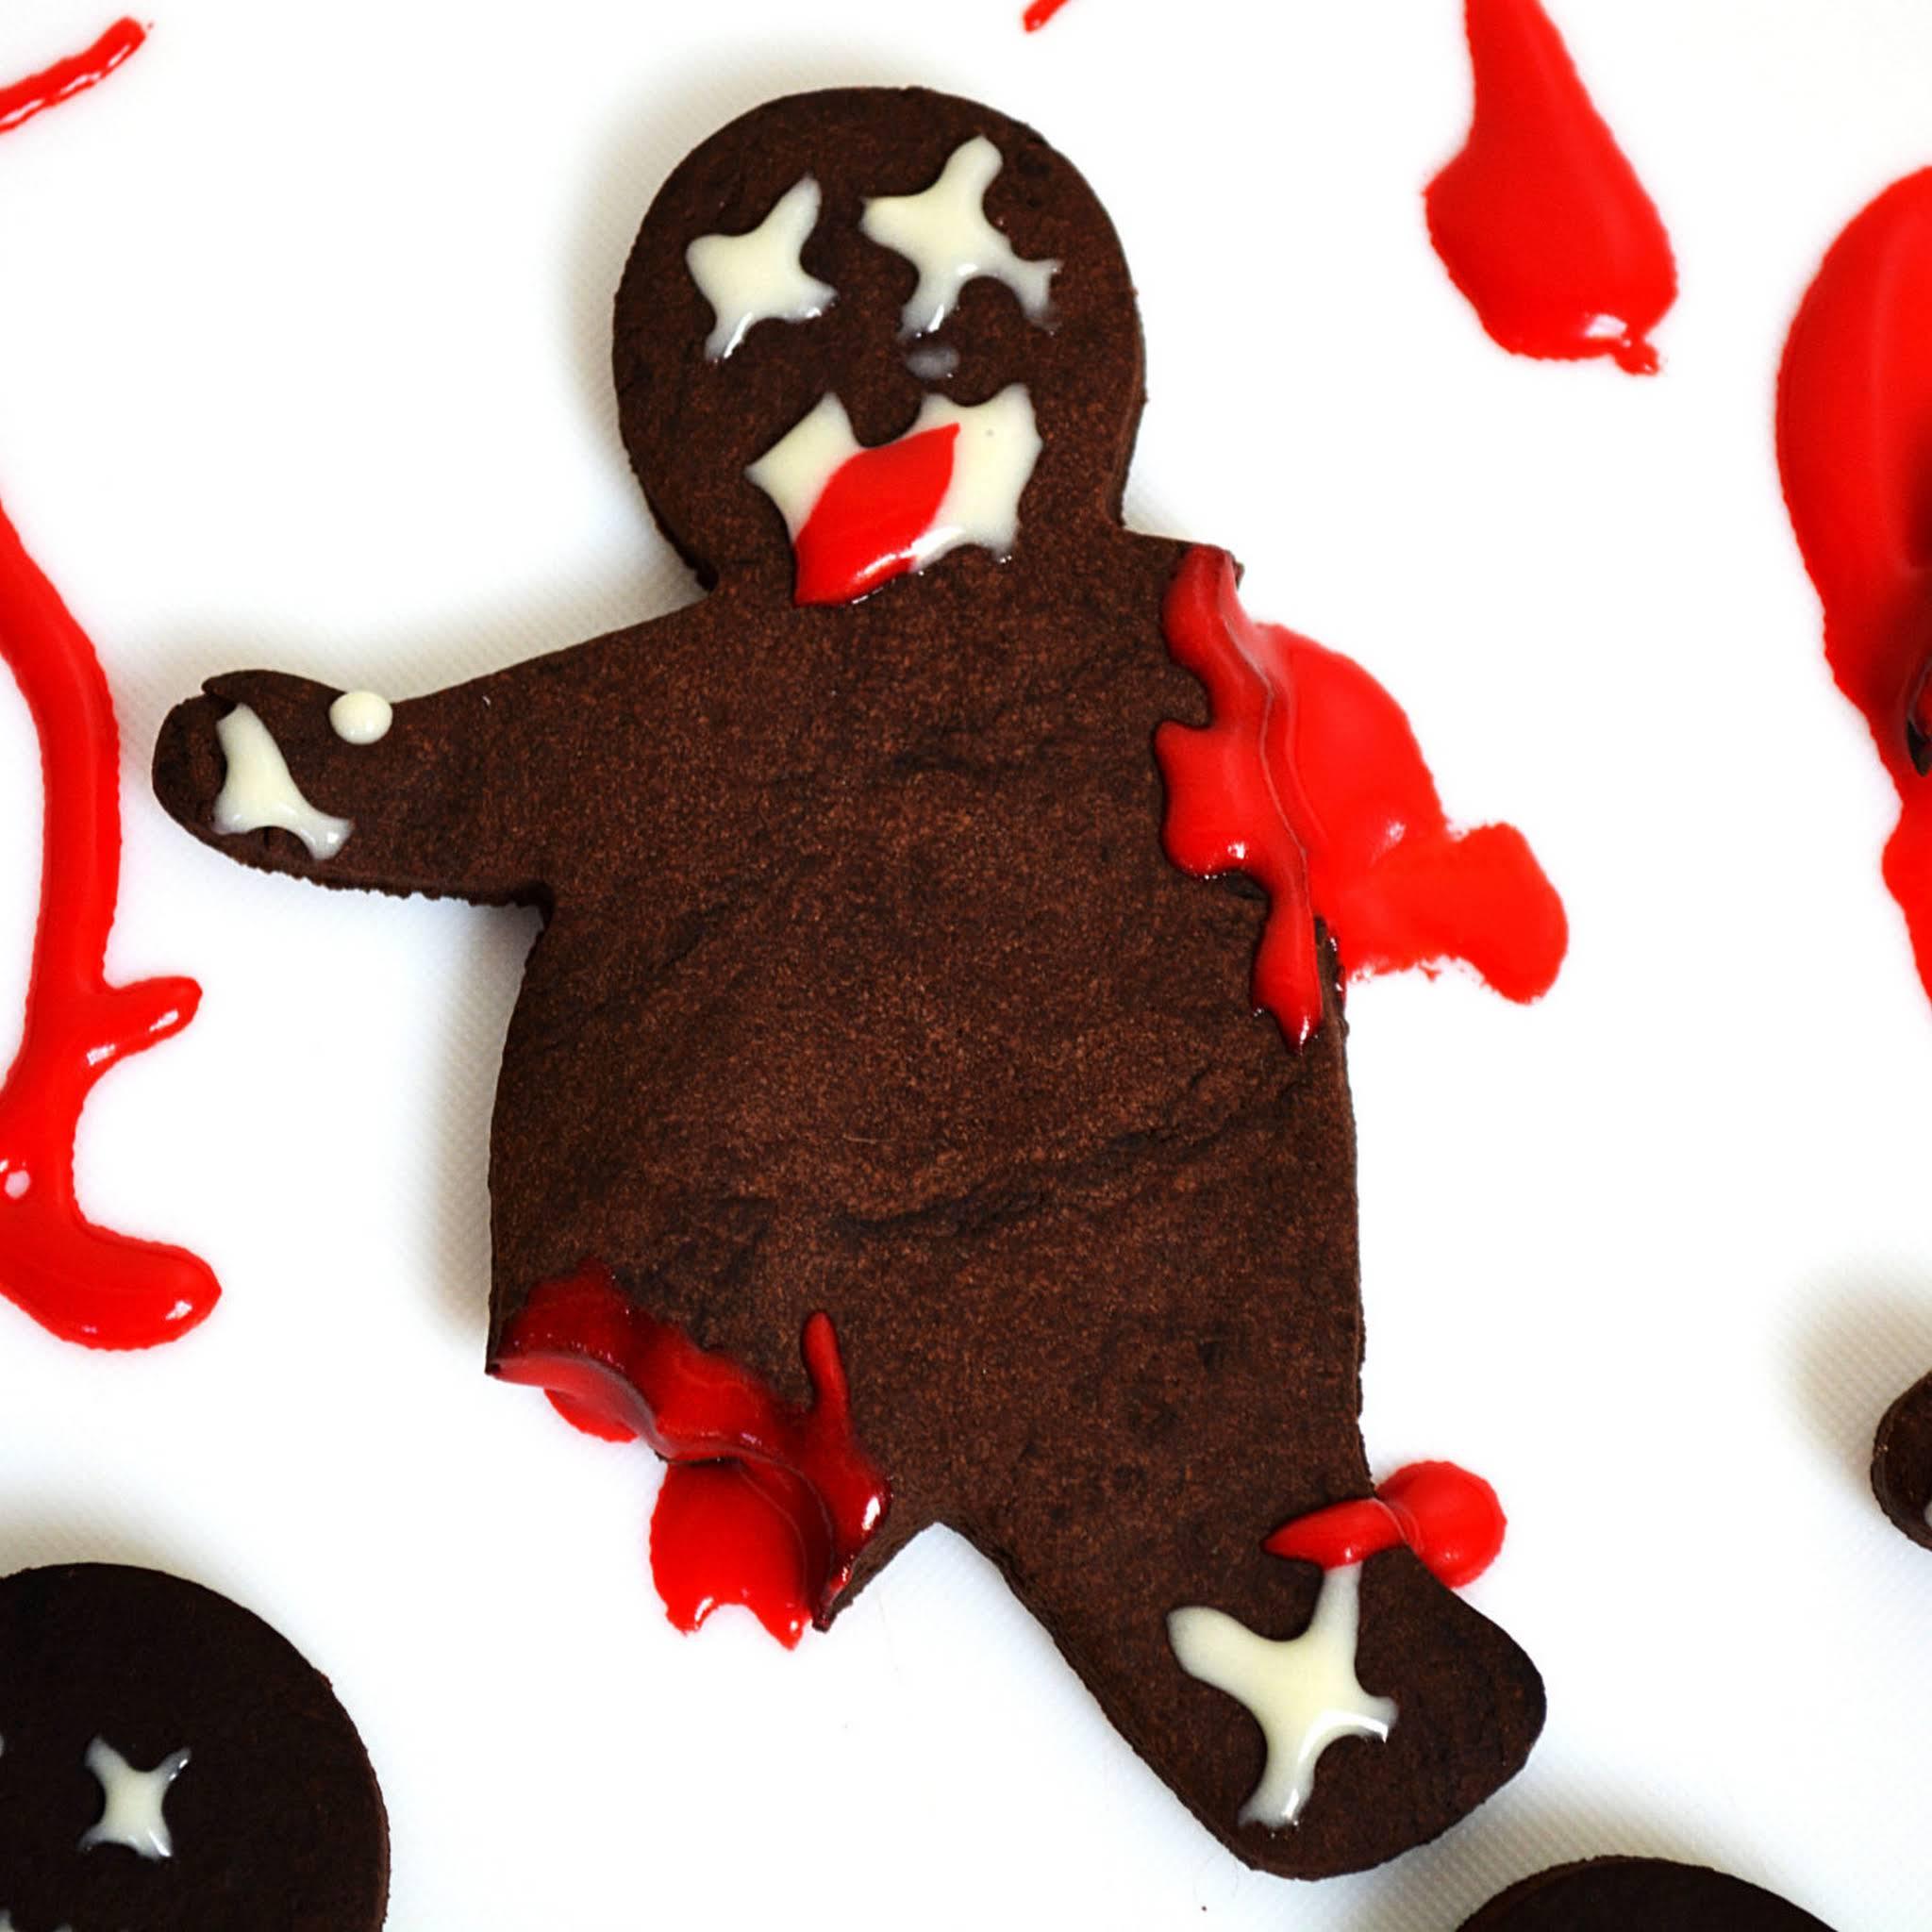 Zombie Chocolate Shortbread Cookies